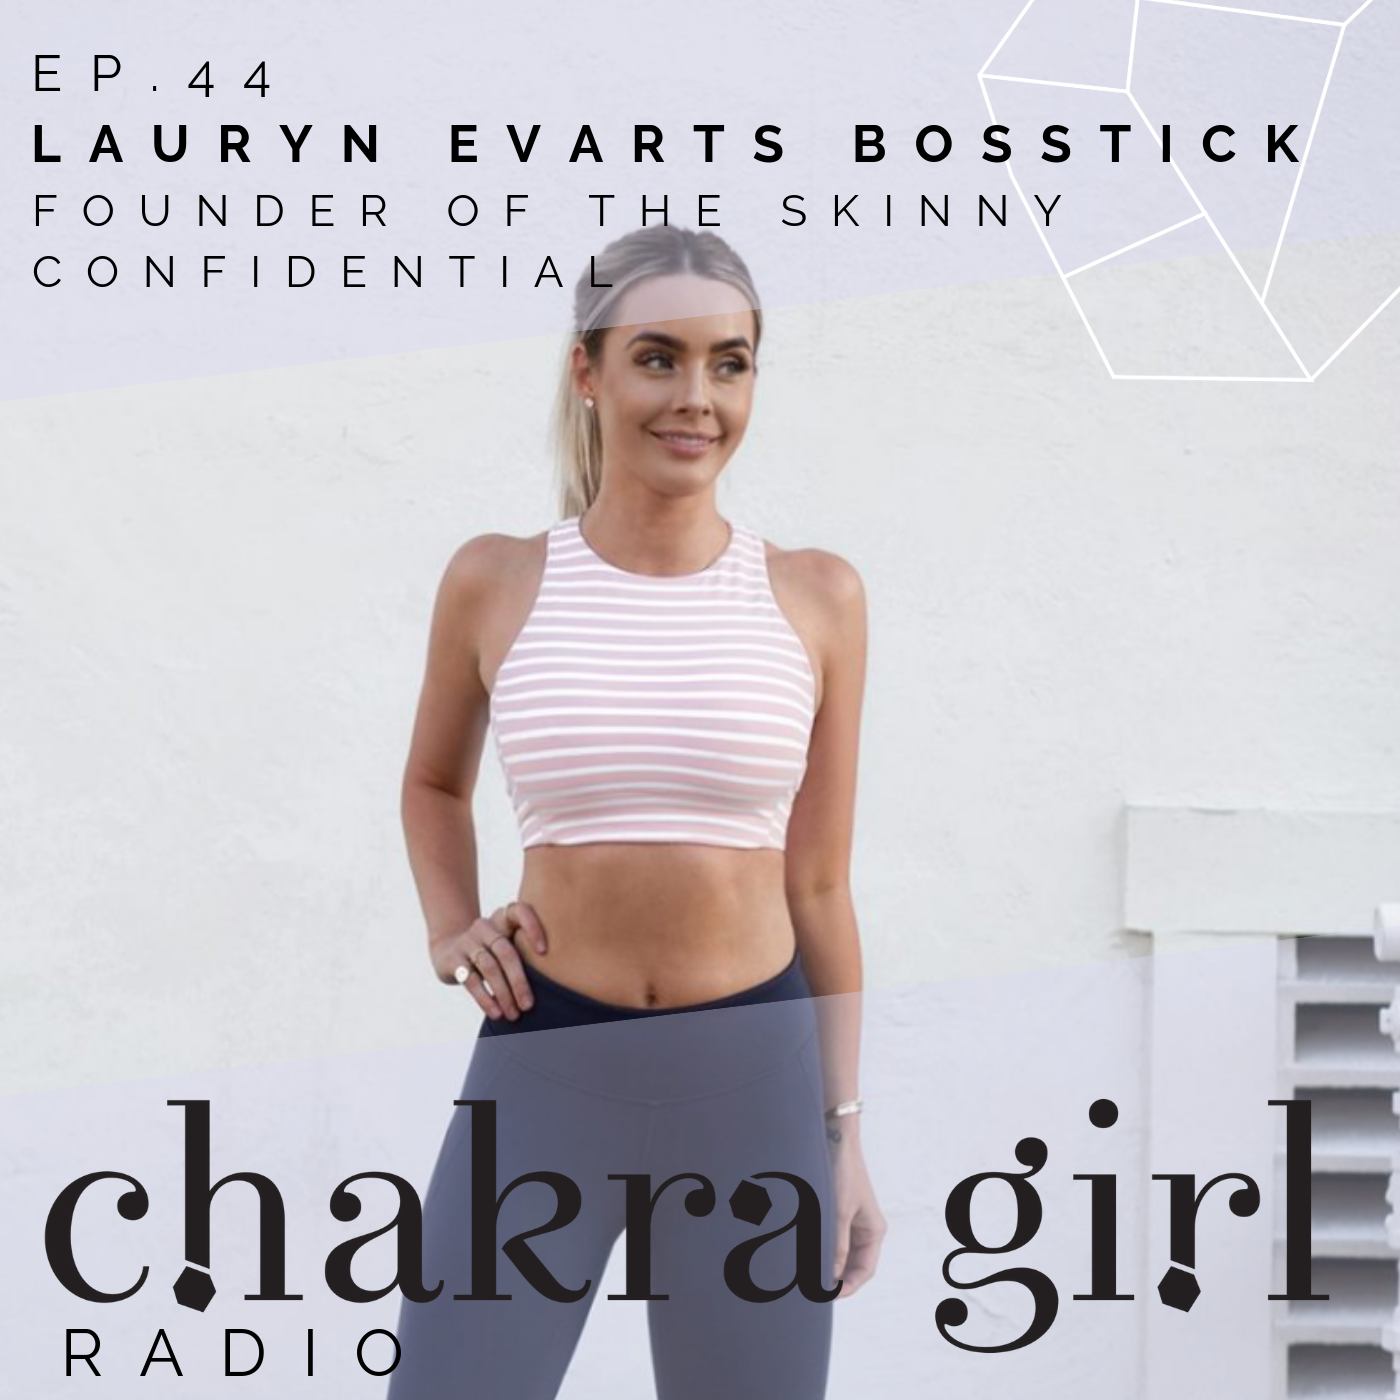 Lauryn+Evarts+Bosstick+on+CHAKRA+GIRL+RADIO.png